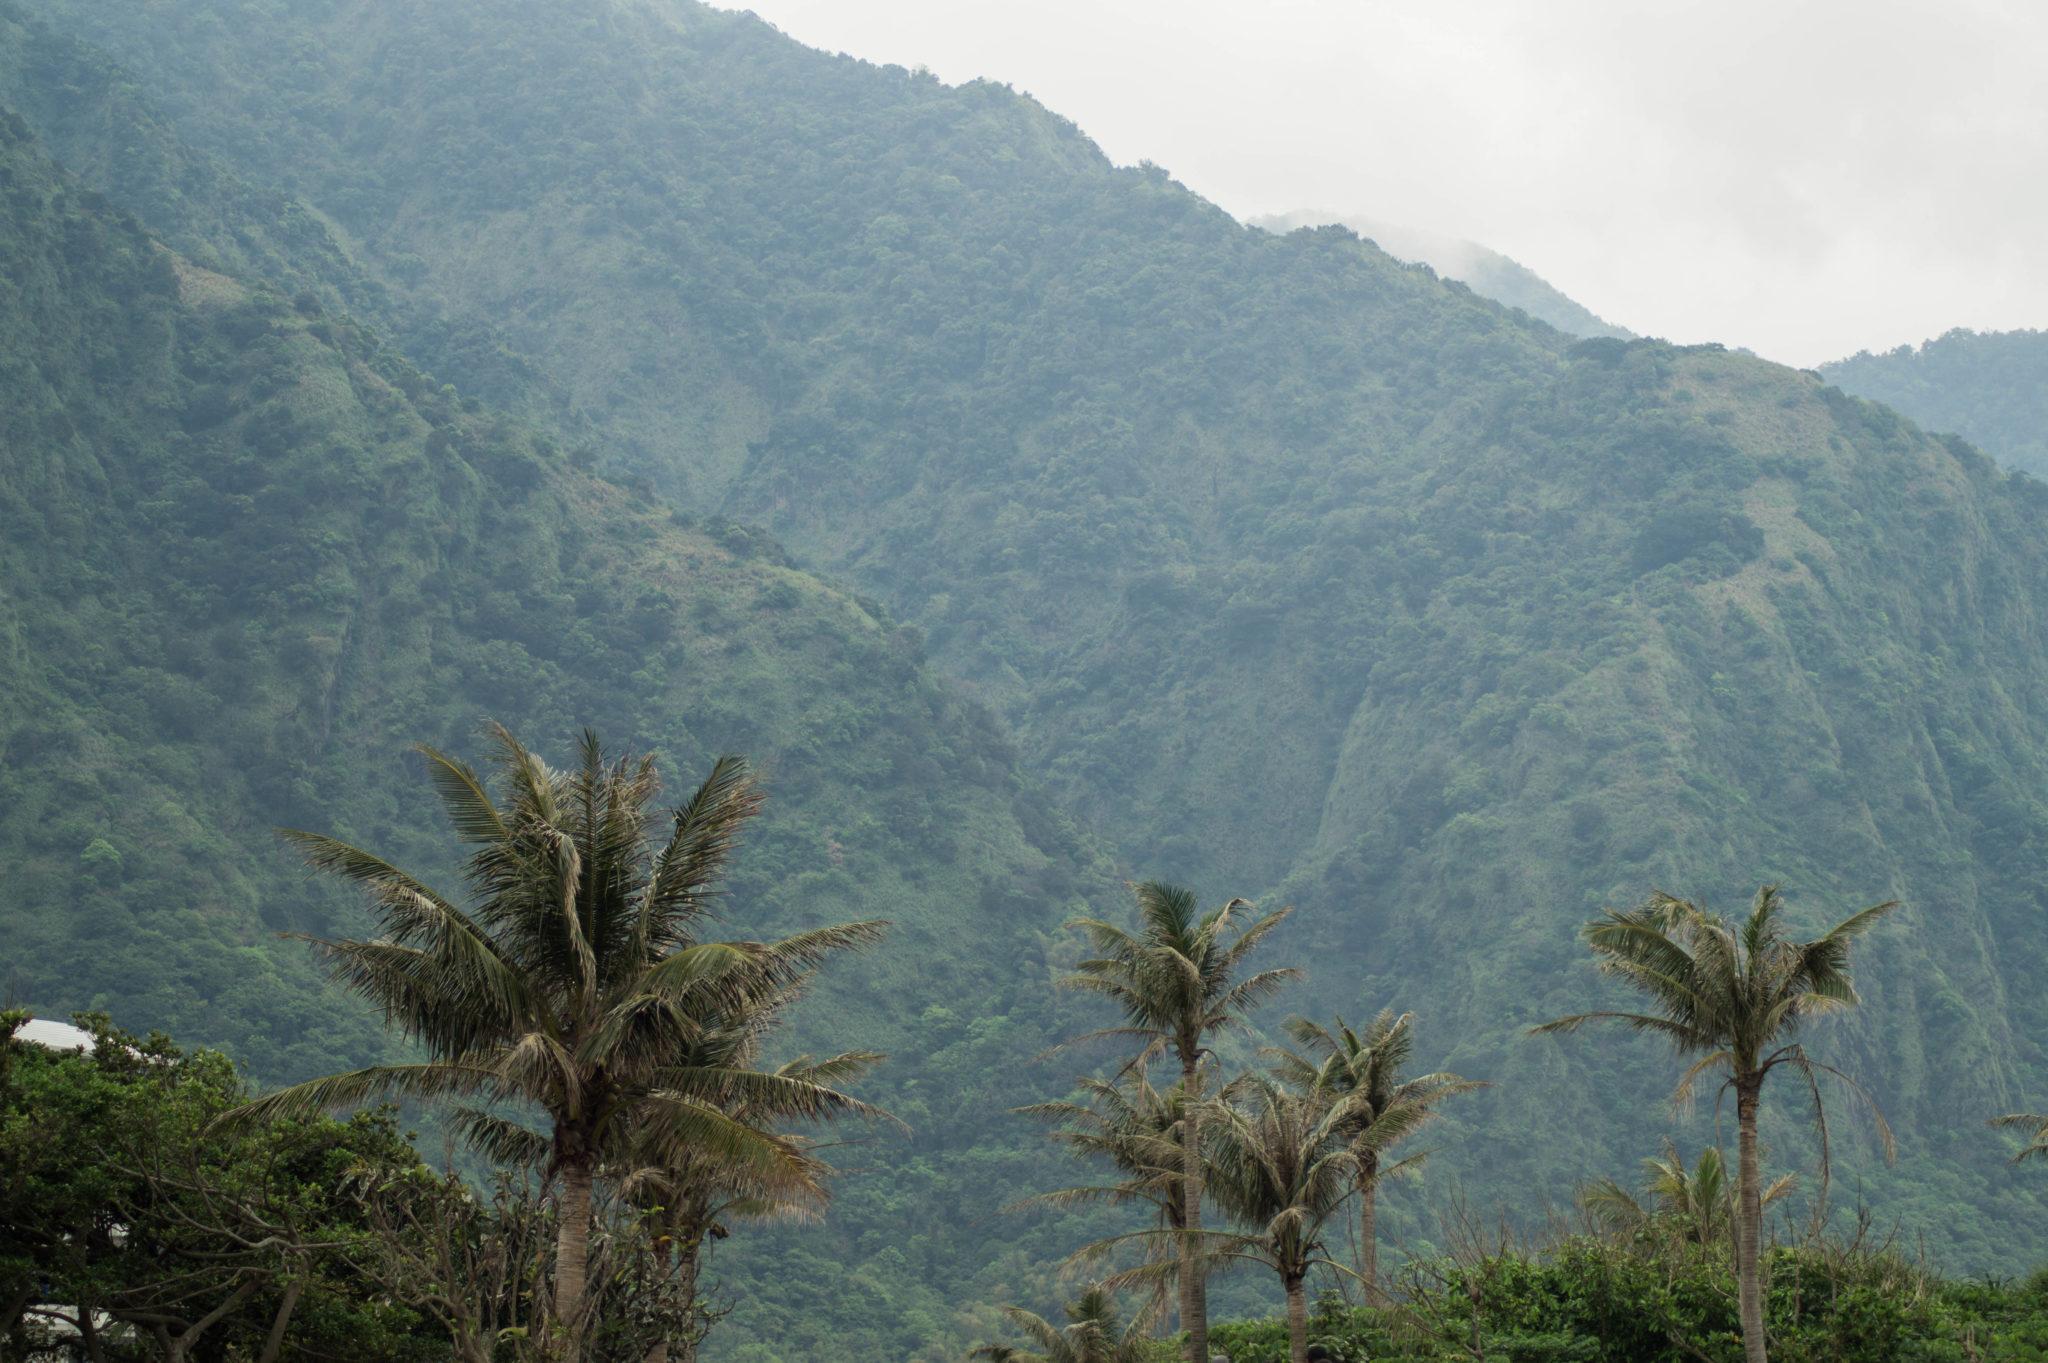 Taiwan Urlaub: Um Taitung herum liegen knallgrüne Berge.